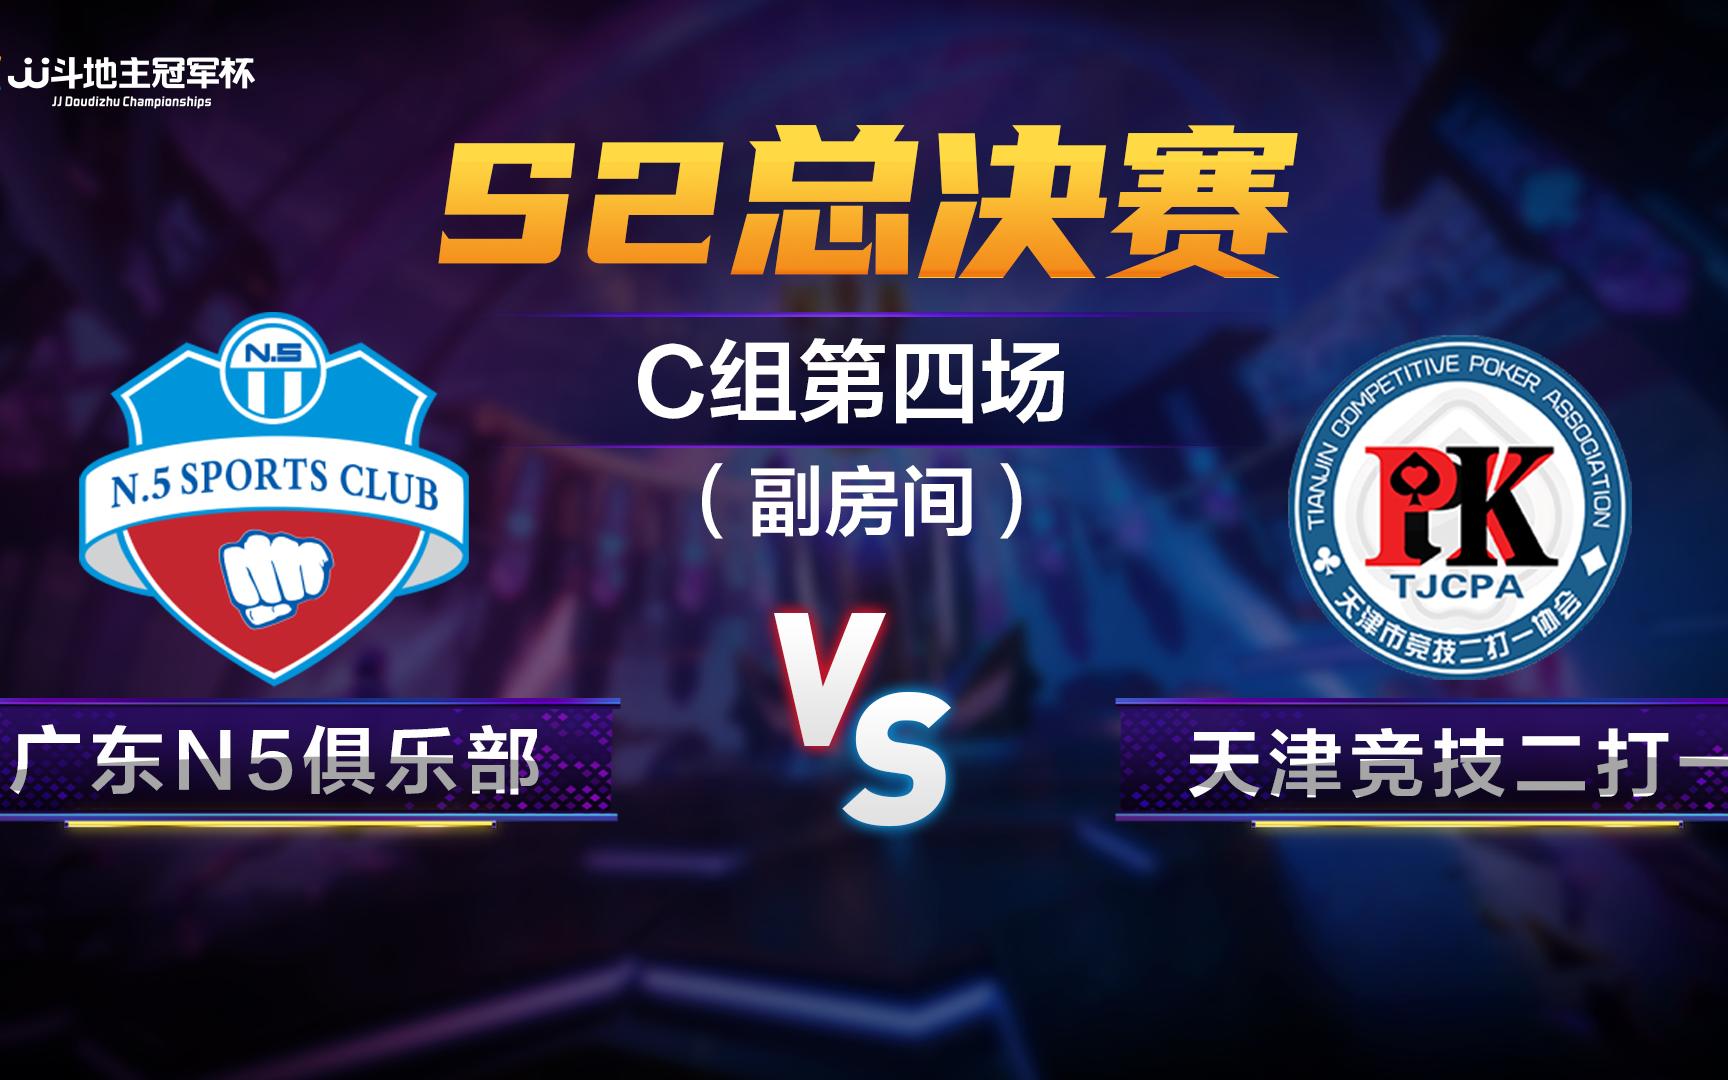 S2总决赛C组第四场12月8日(副房间):广东N5俱乐部 vs 天津竞技二打一